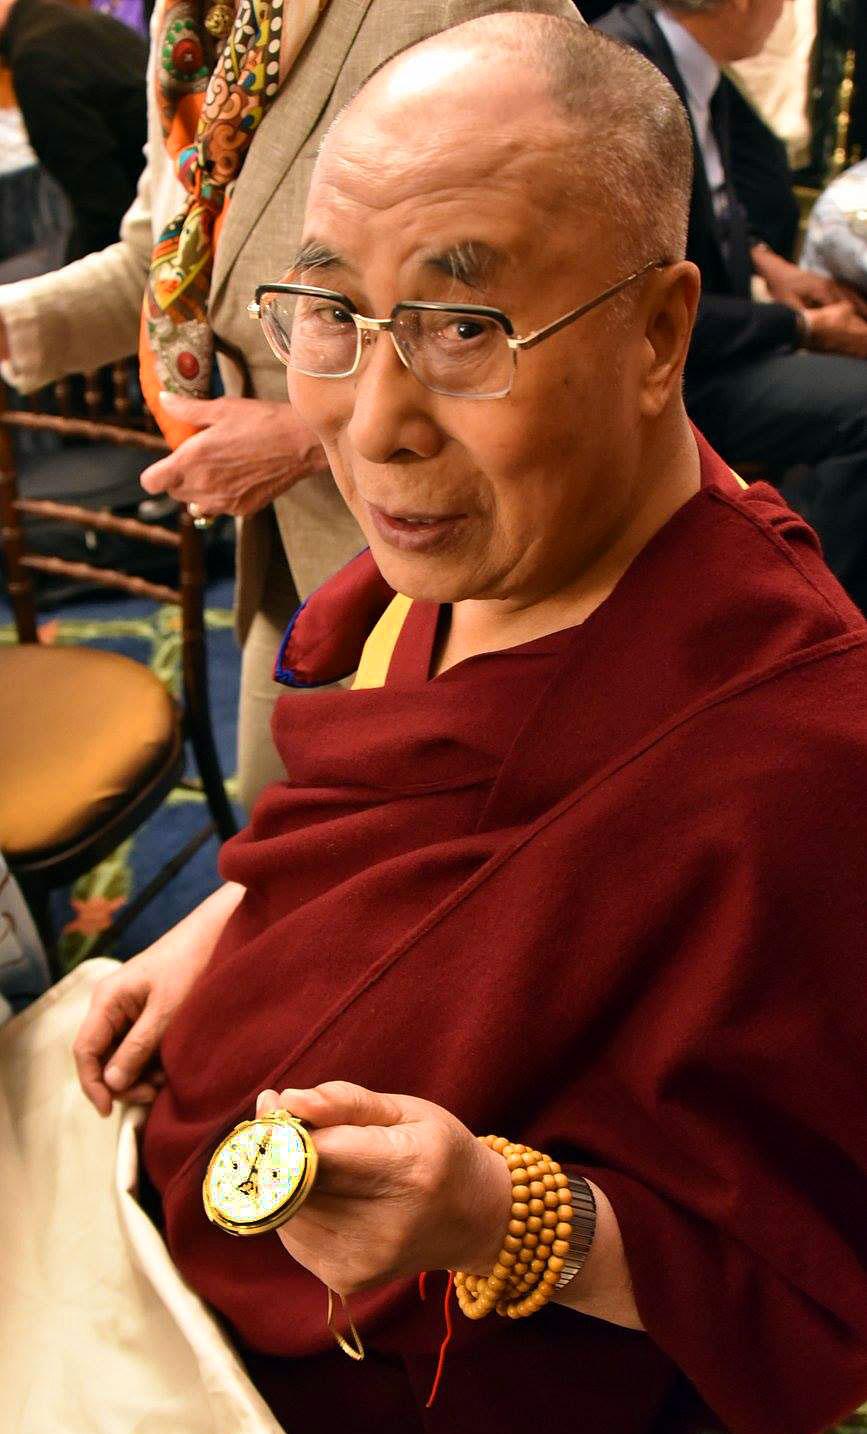 dalai-lam-patek-philippe.jpg